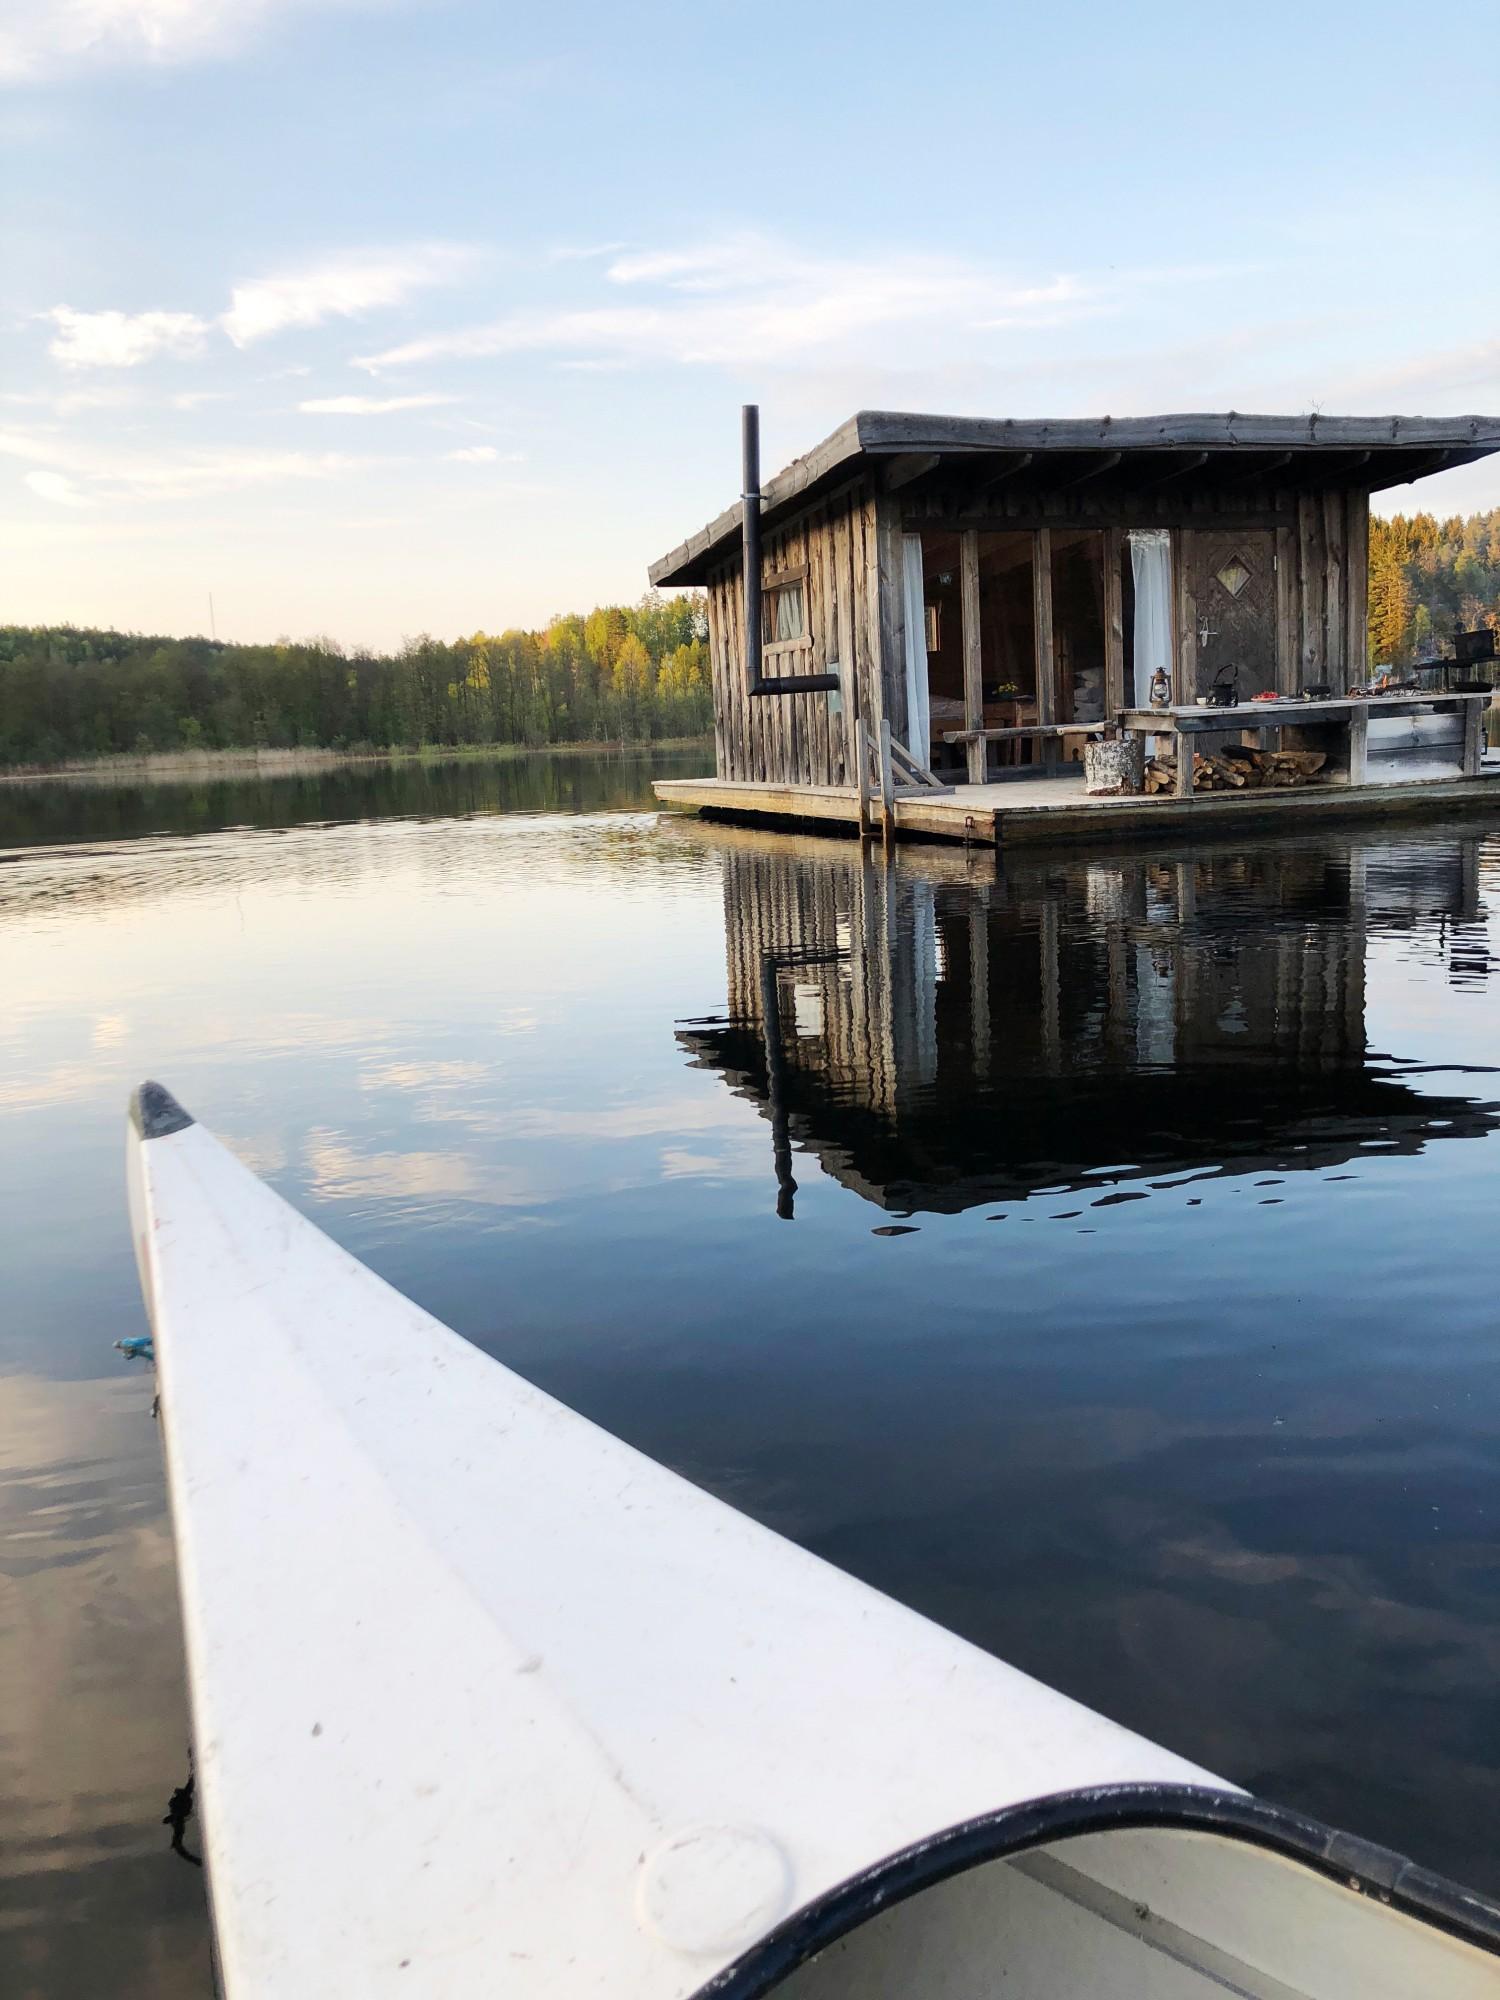 Naturbyn floating cabin